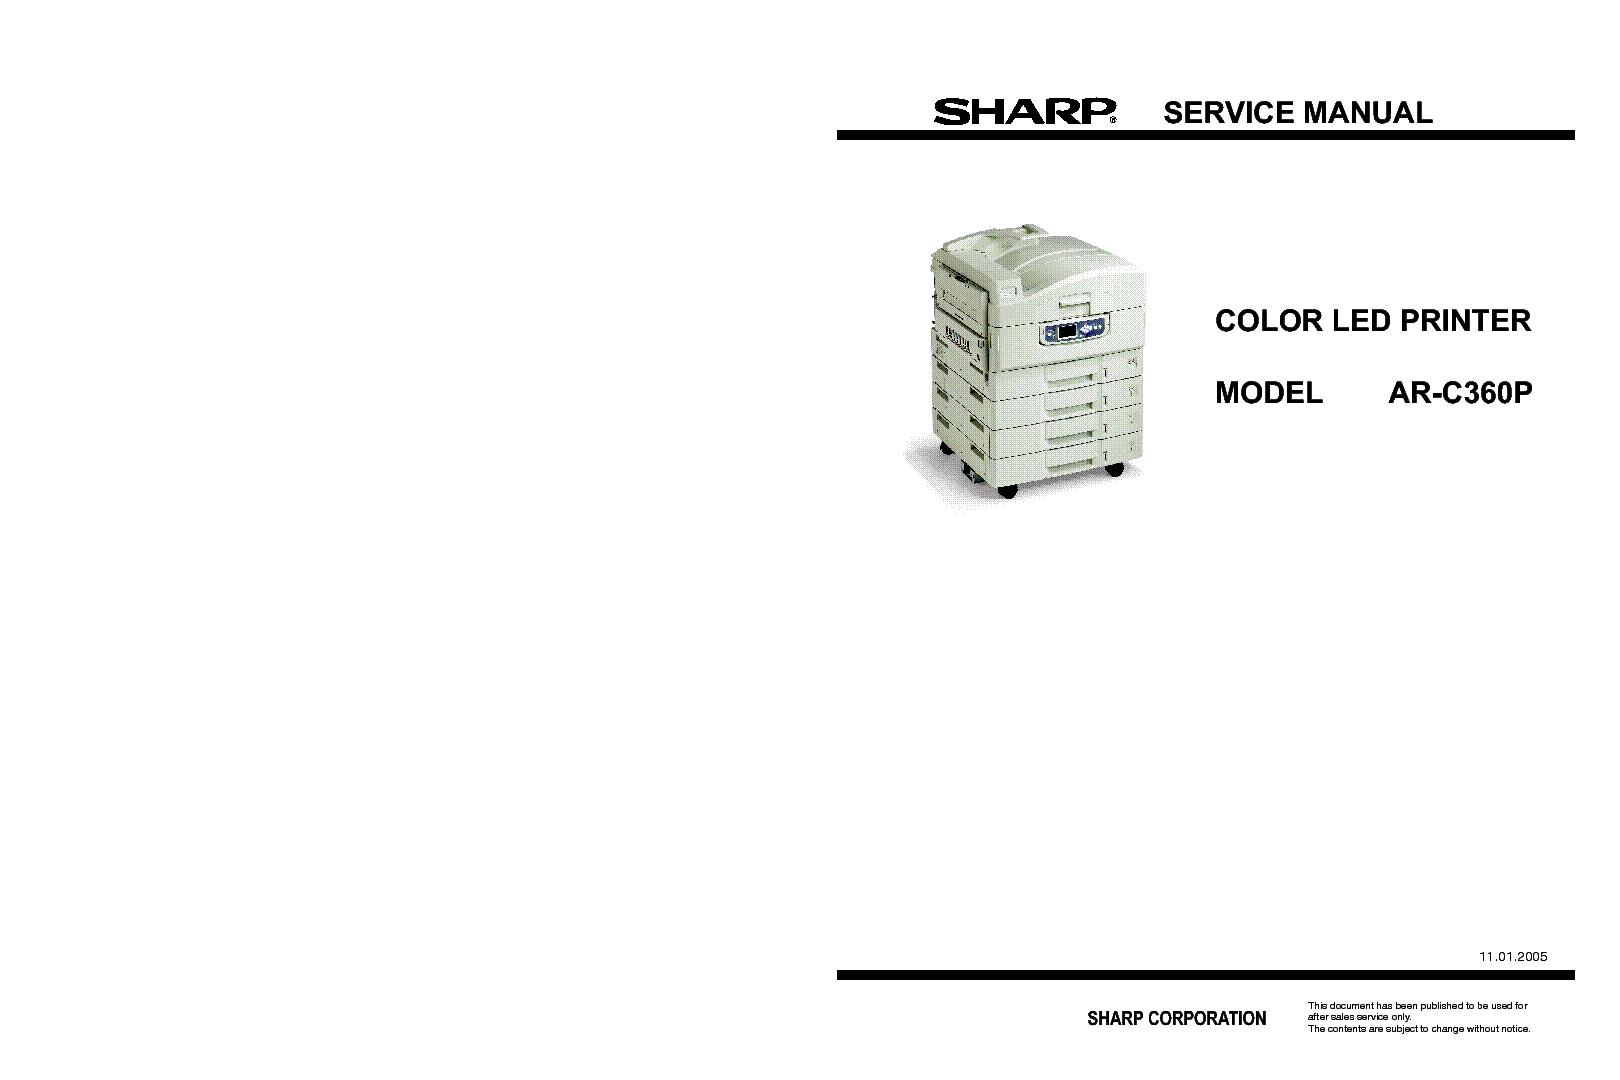 SHARP AR-C360P service manual (1st page)